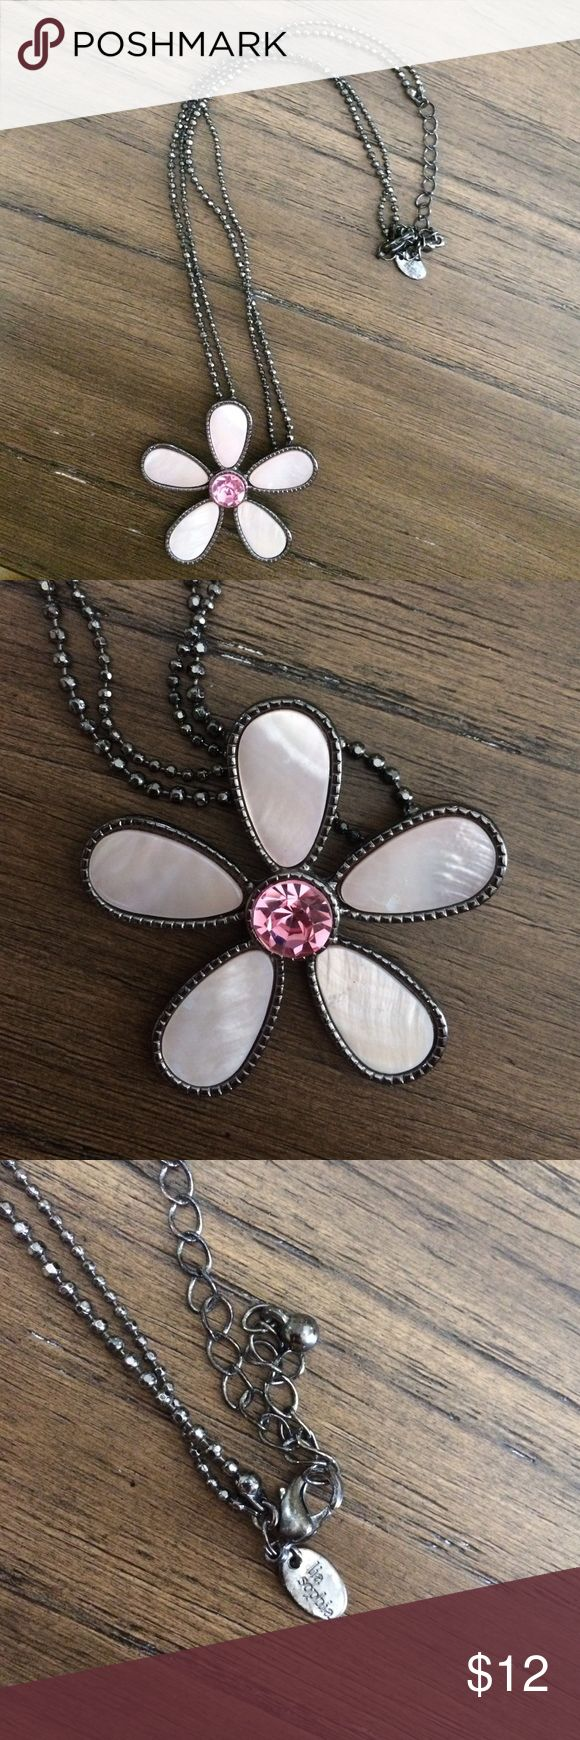 Lia Sophia necklace Lia Sophia necklace w/ pink flower pendant. Any girl would love! Lia Sophia Jewelry Necklaces